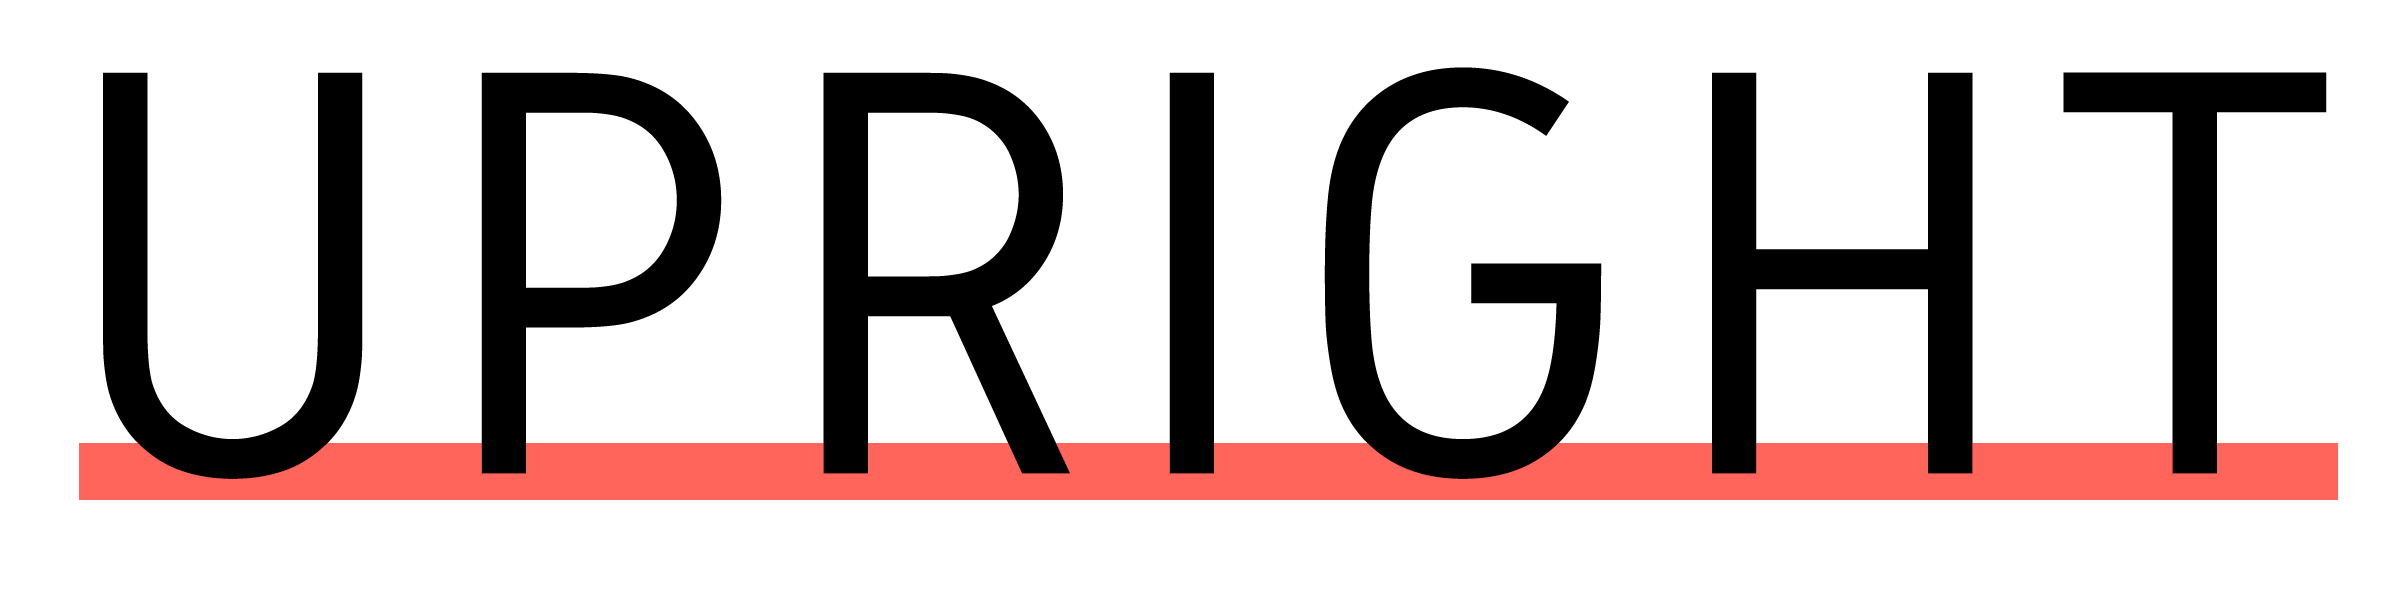 upright logo_transparent_2018.png